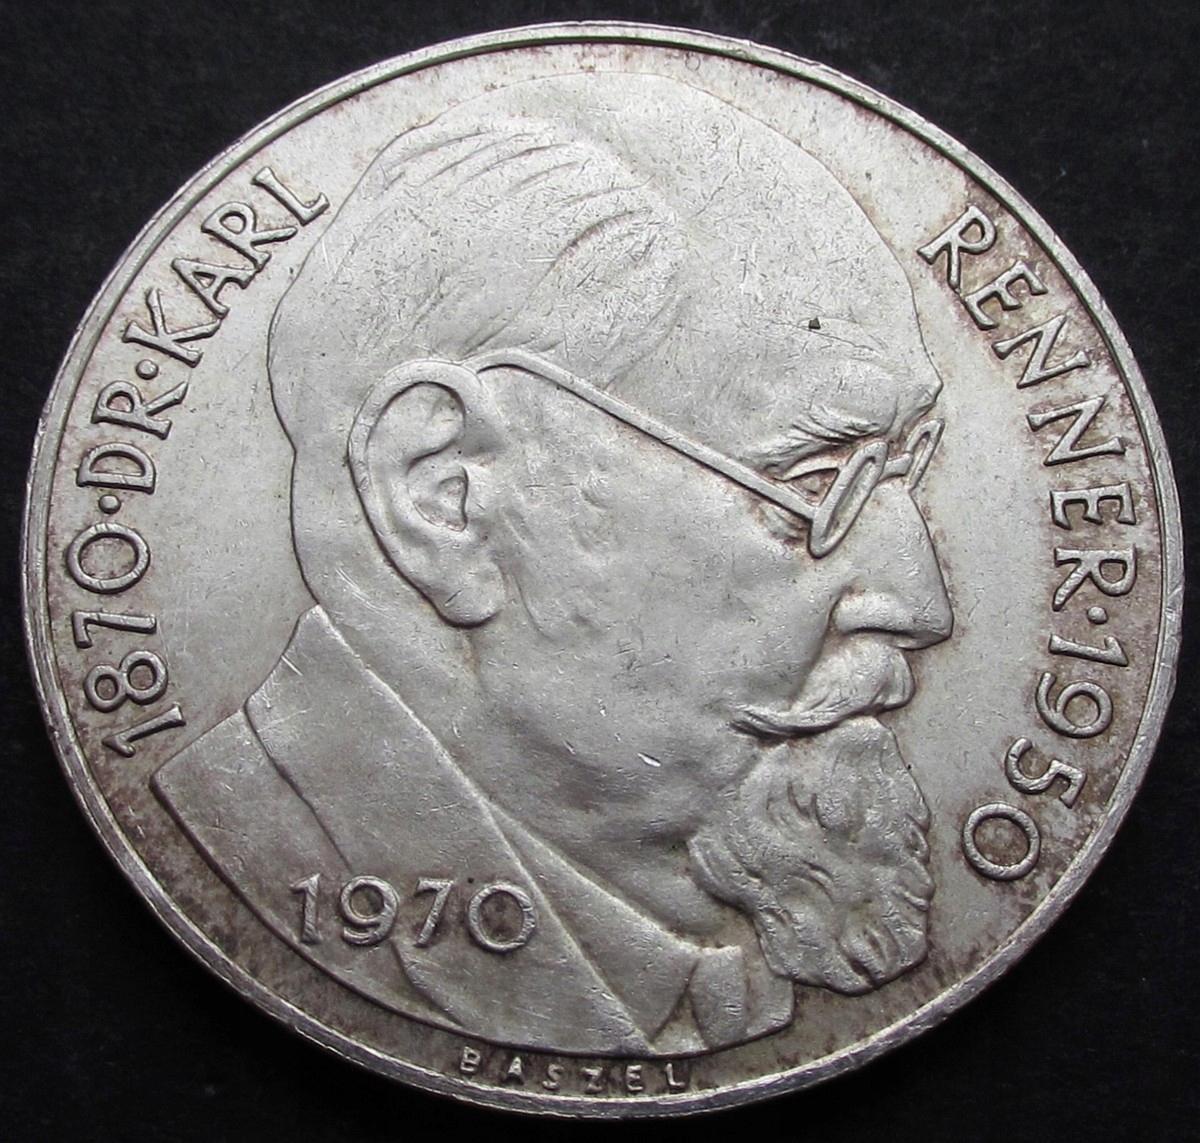 ANK AUSTRIA 50 SCHILLING 1970 RENNER st. I-/I